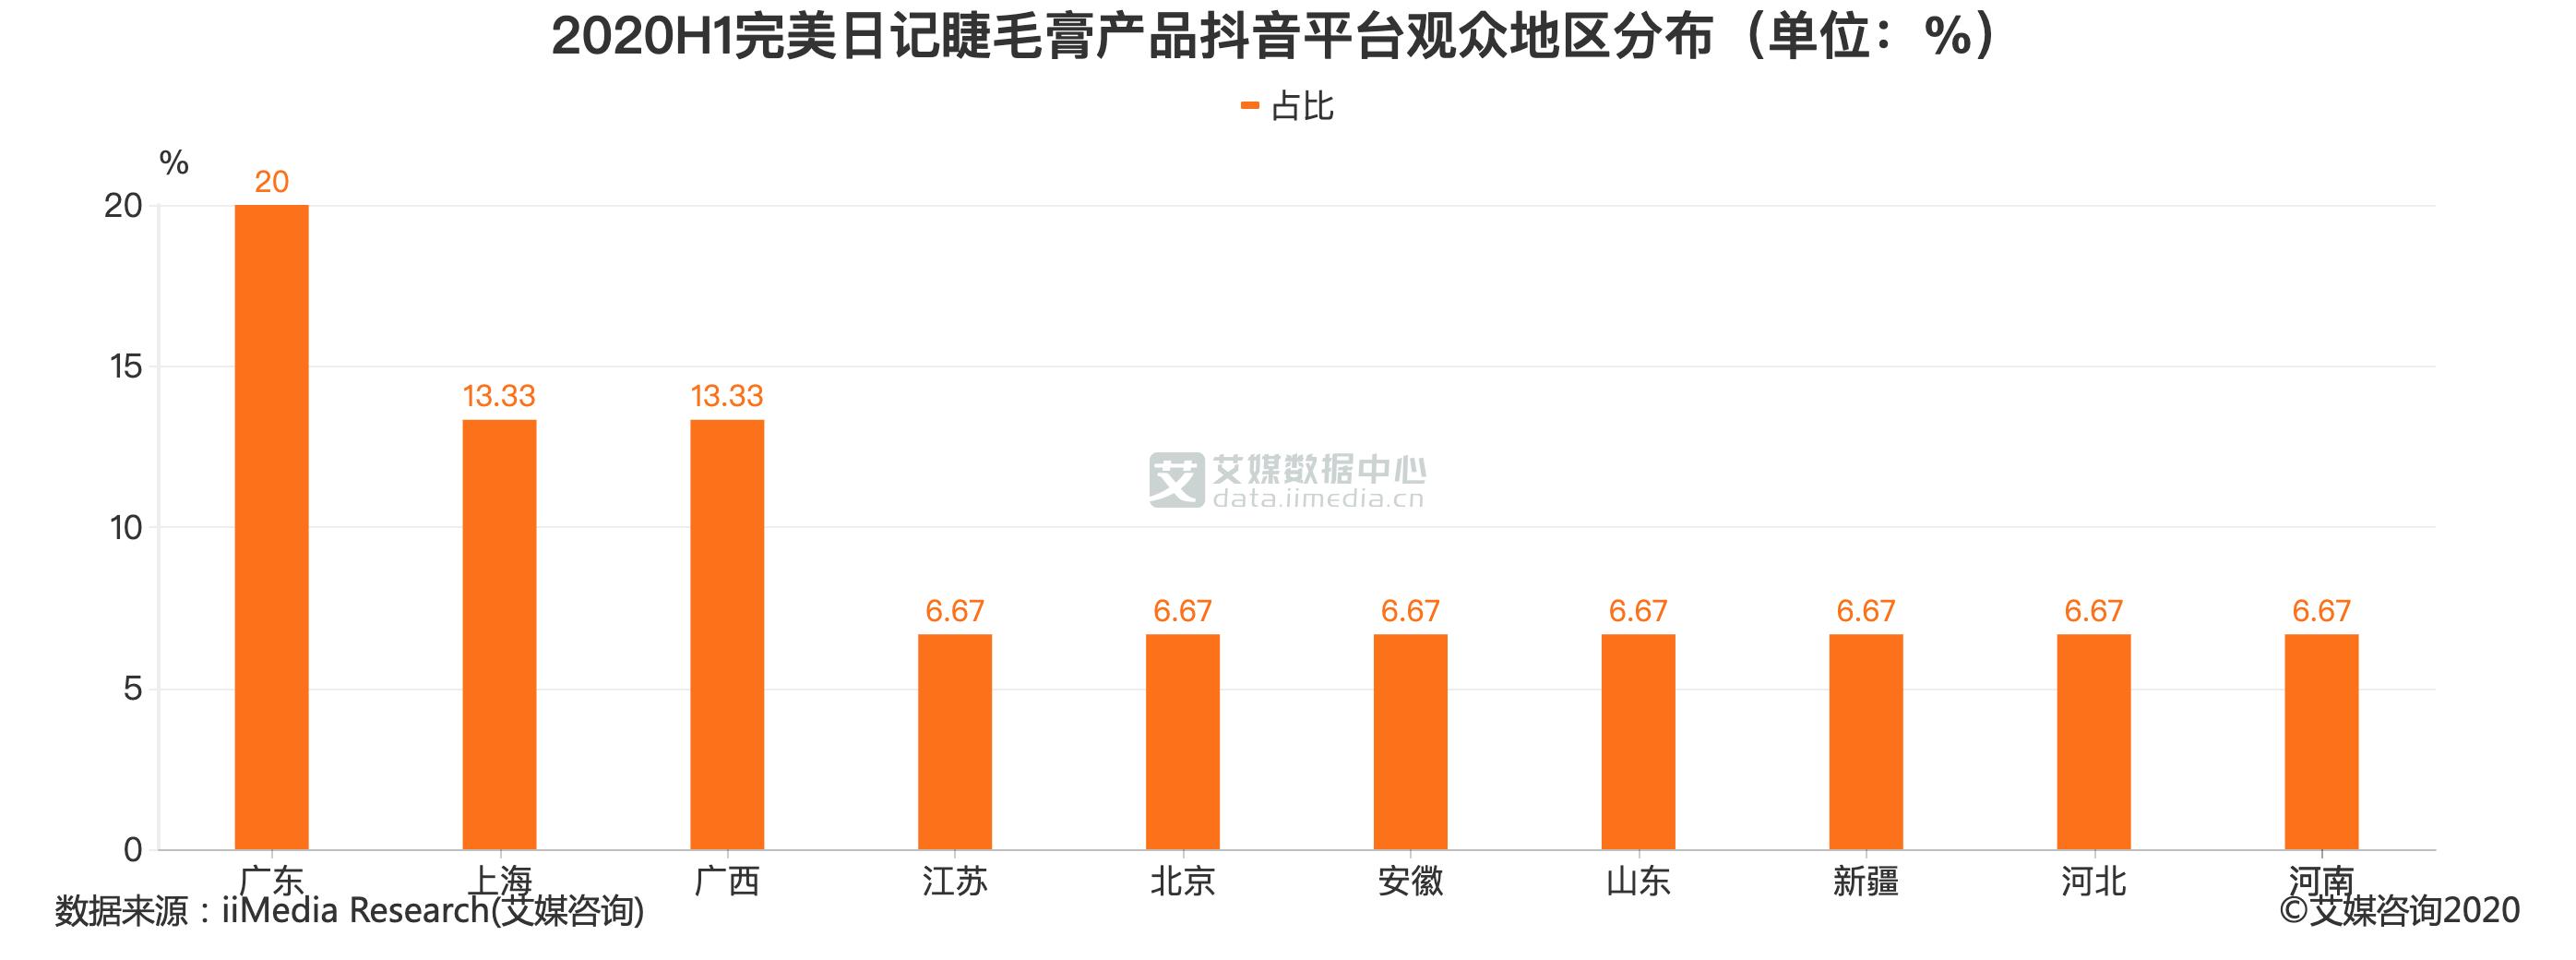 2020H1完美日记睫毛膏产品抖音平台观众地区分布(单位:%)